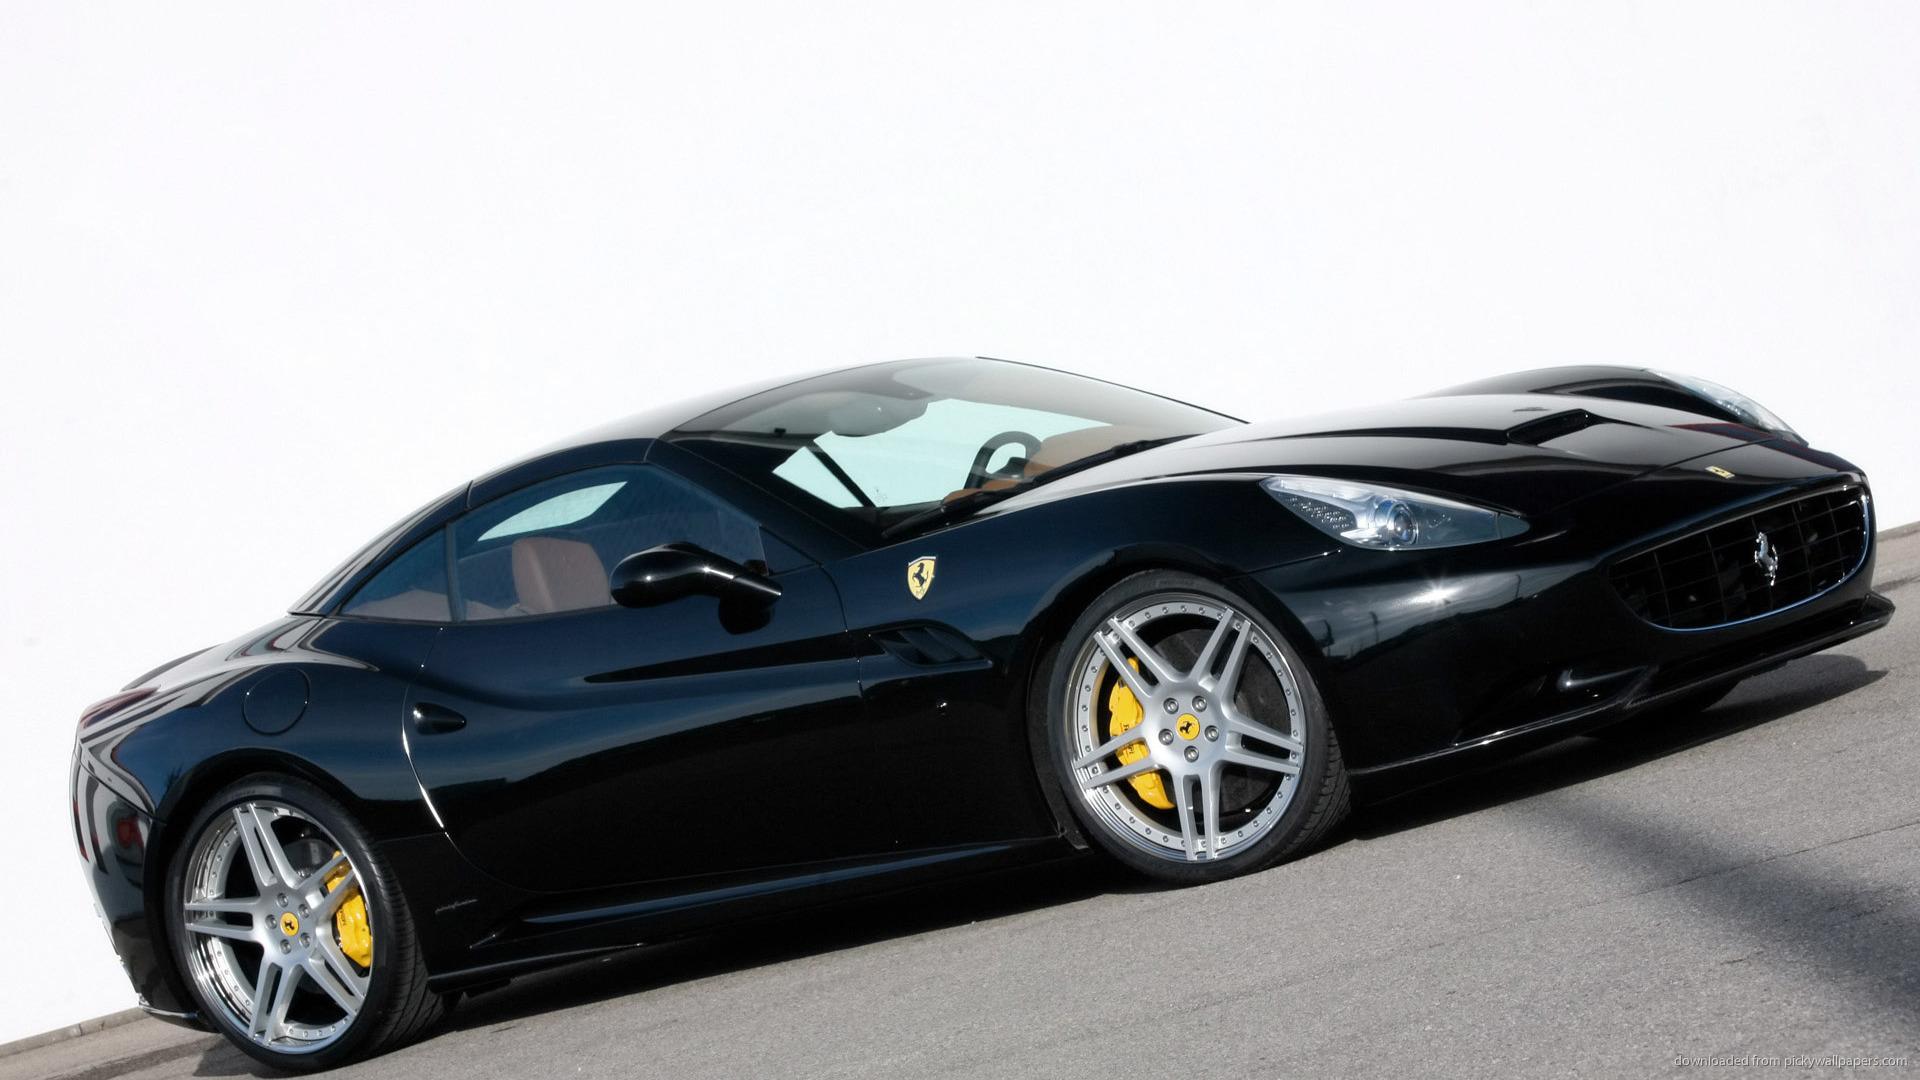 Black Ferrari Wallpaper 2 Desktop Background